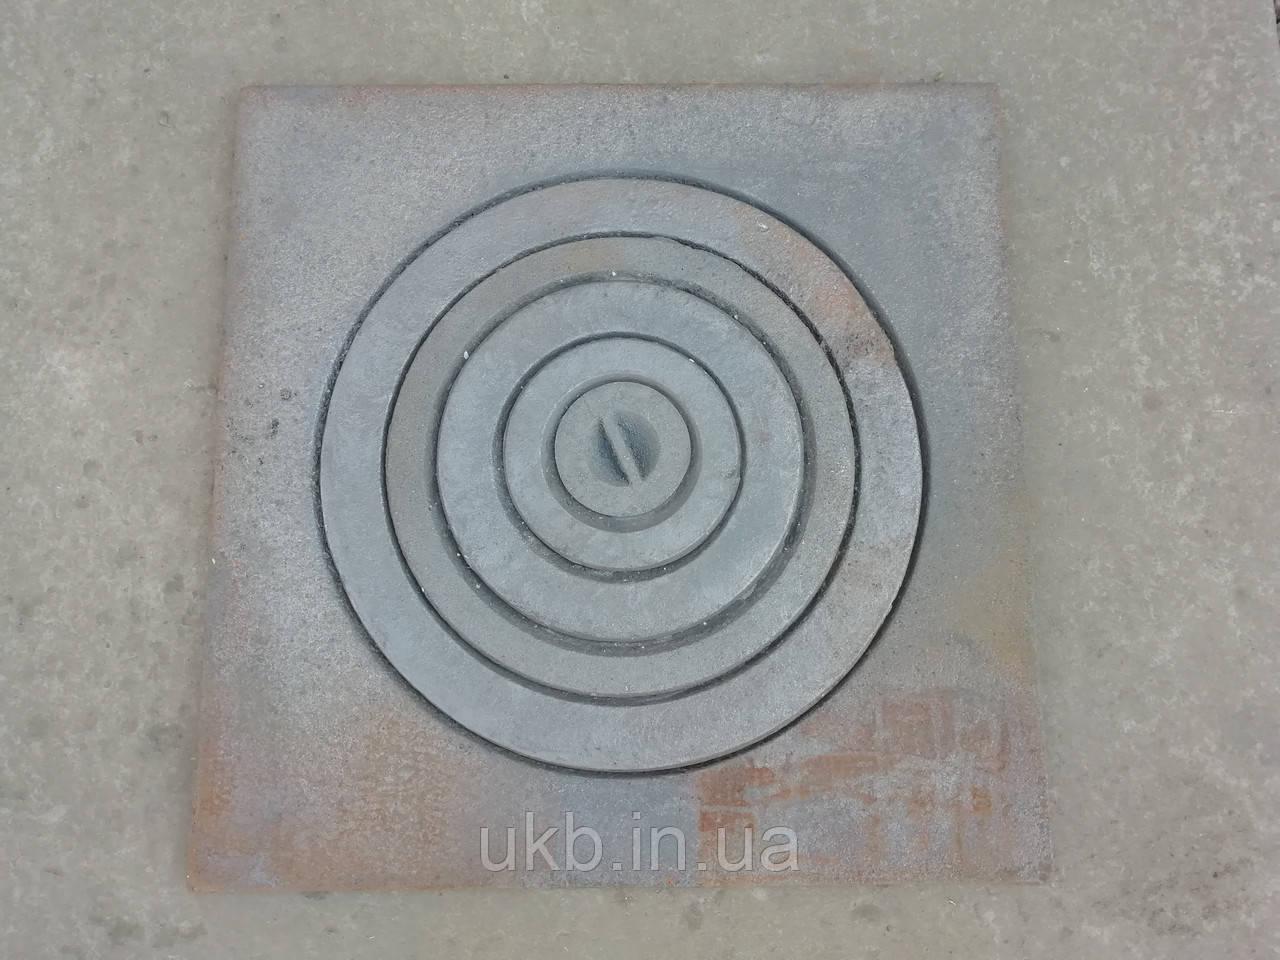 Плита под Казан 540*540 мм (24кг) / Плита до Казана 540*540мм (24кг)